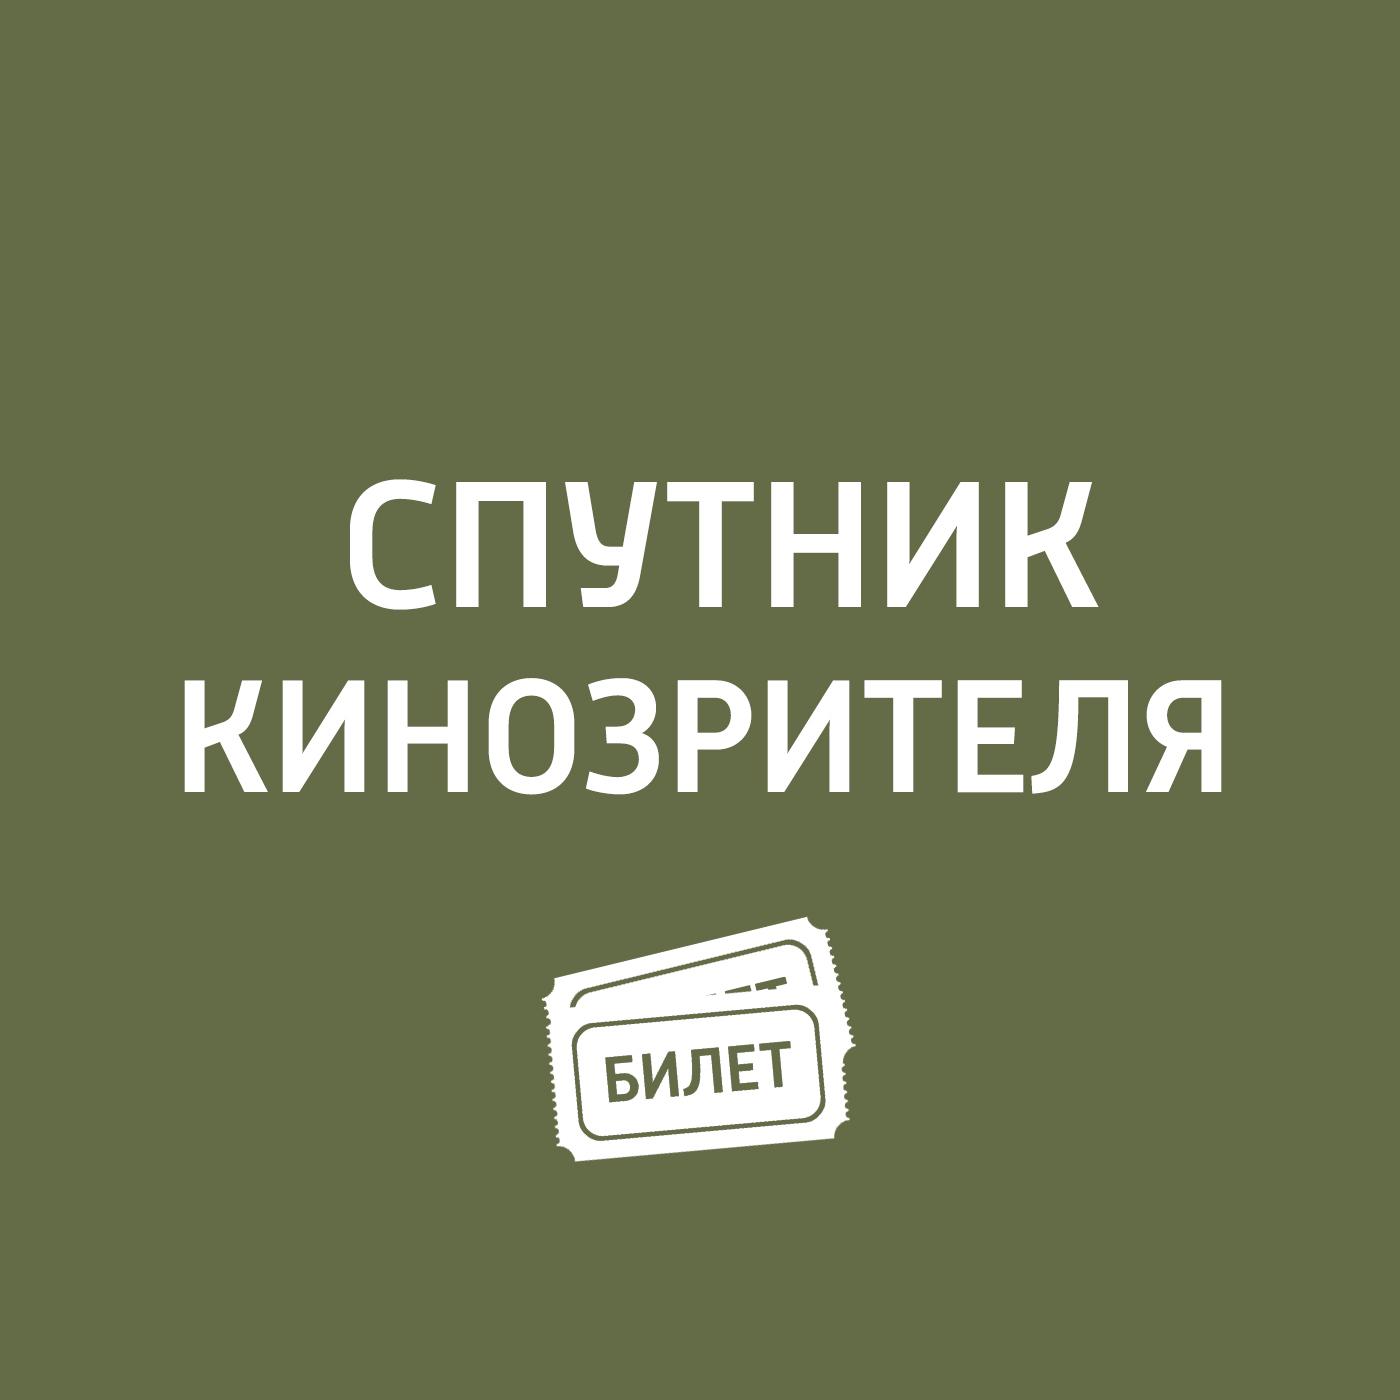 Антон Долин Судья, «Прогулка среди могил, «Сен-Лоран. Стиль - это я, «Weekend, «Эли